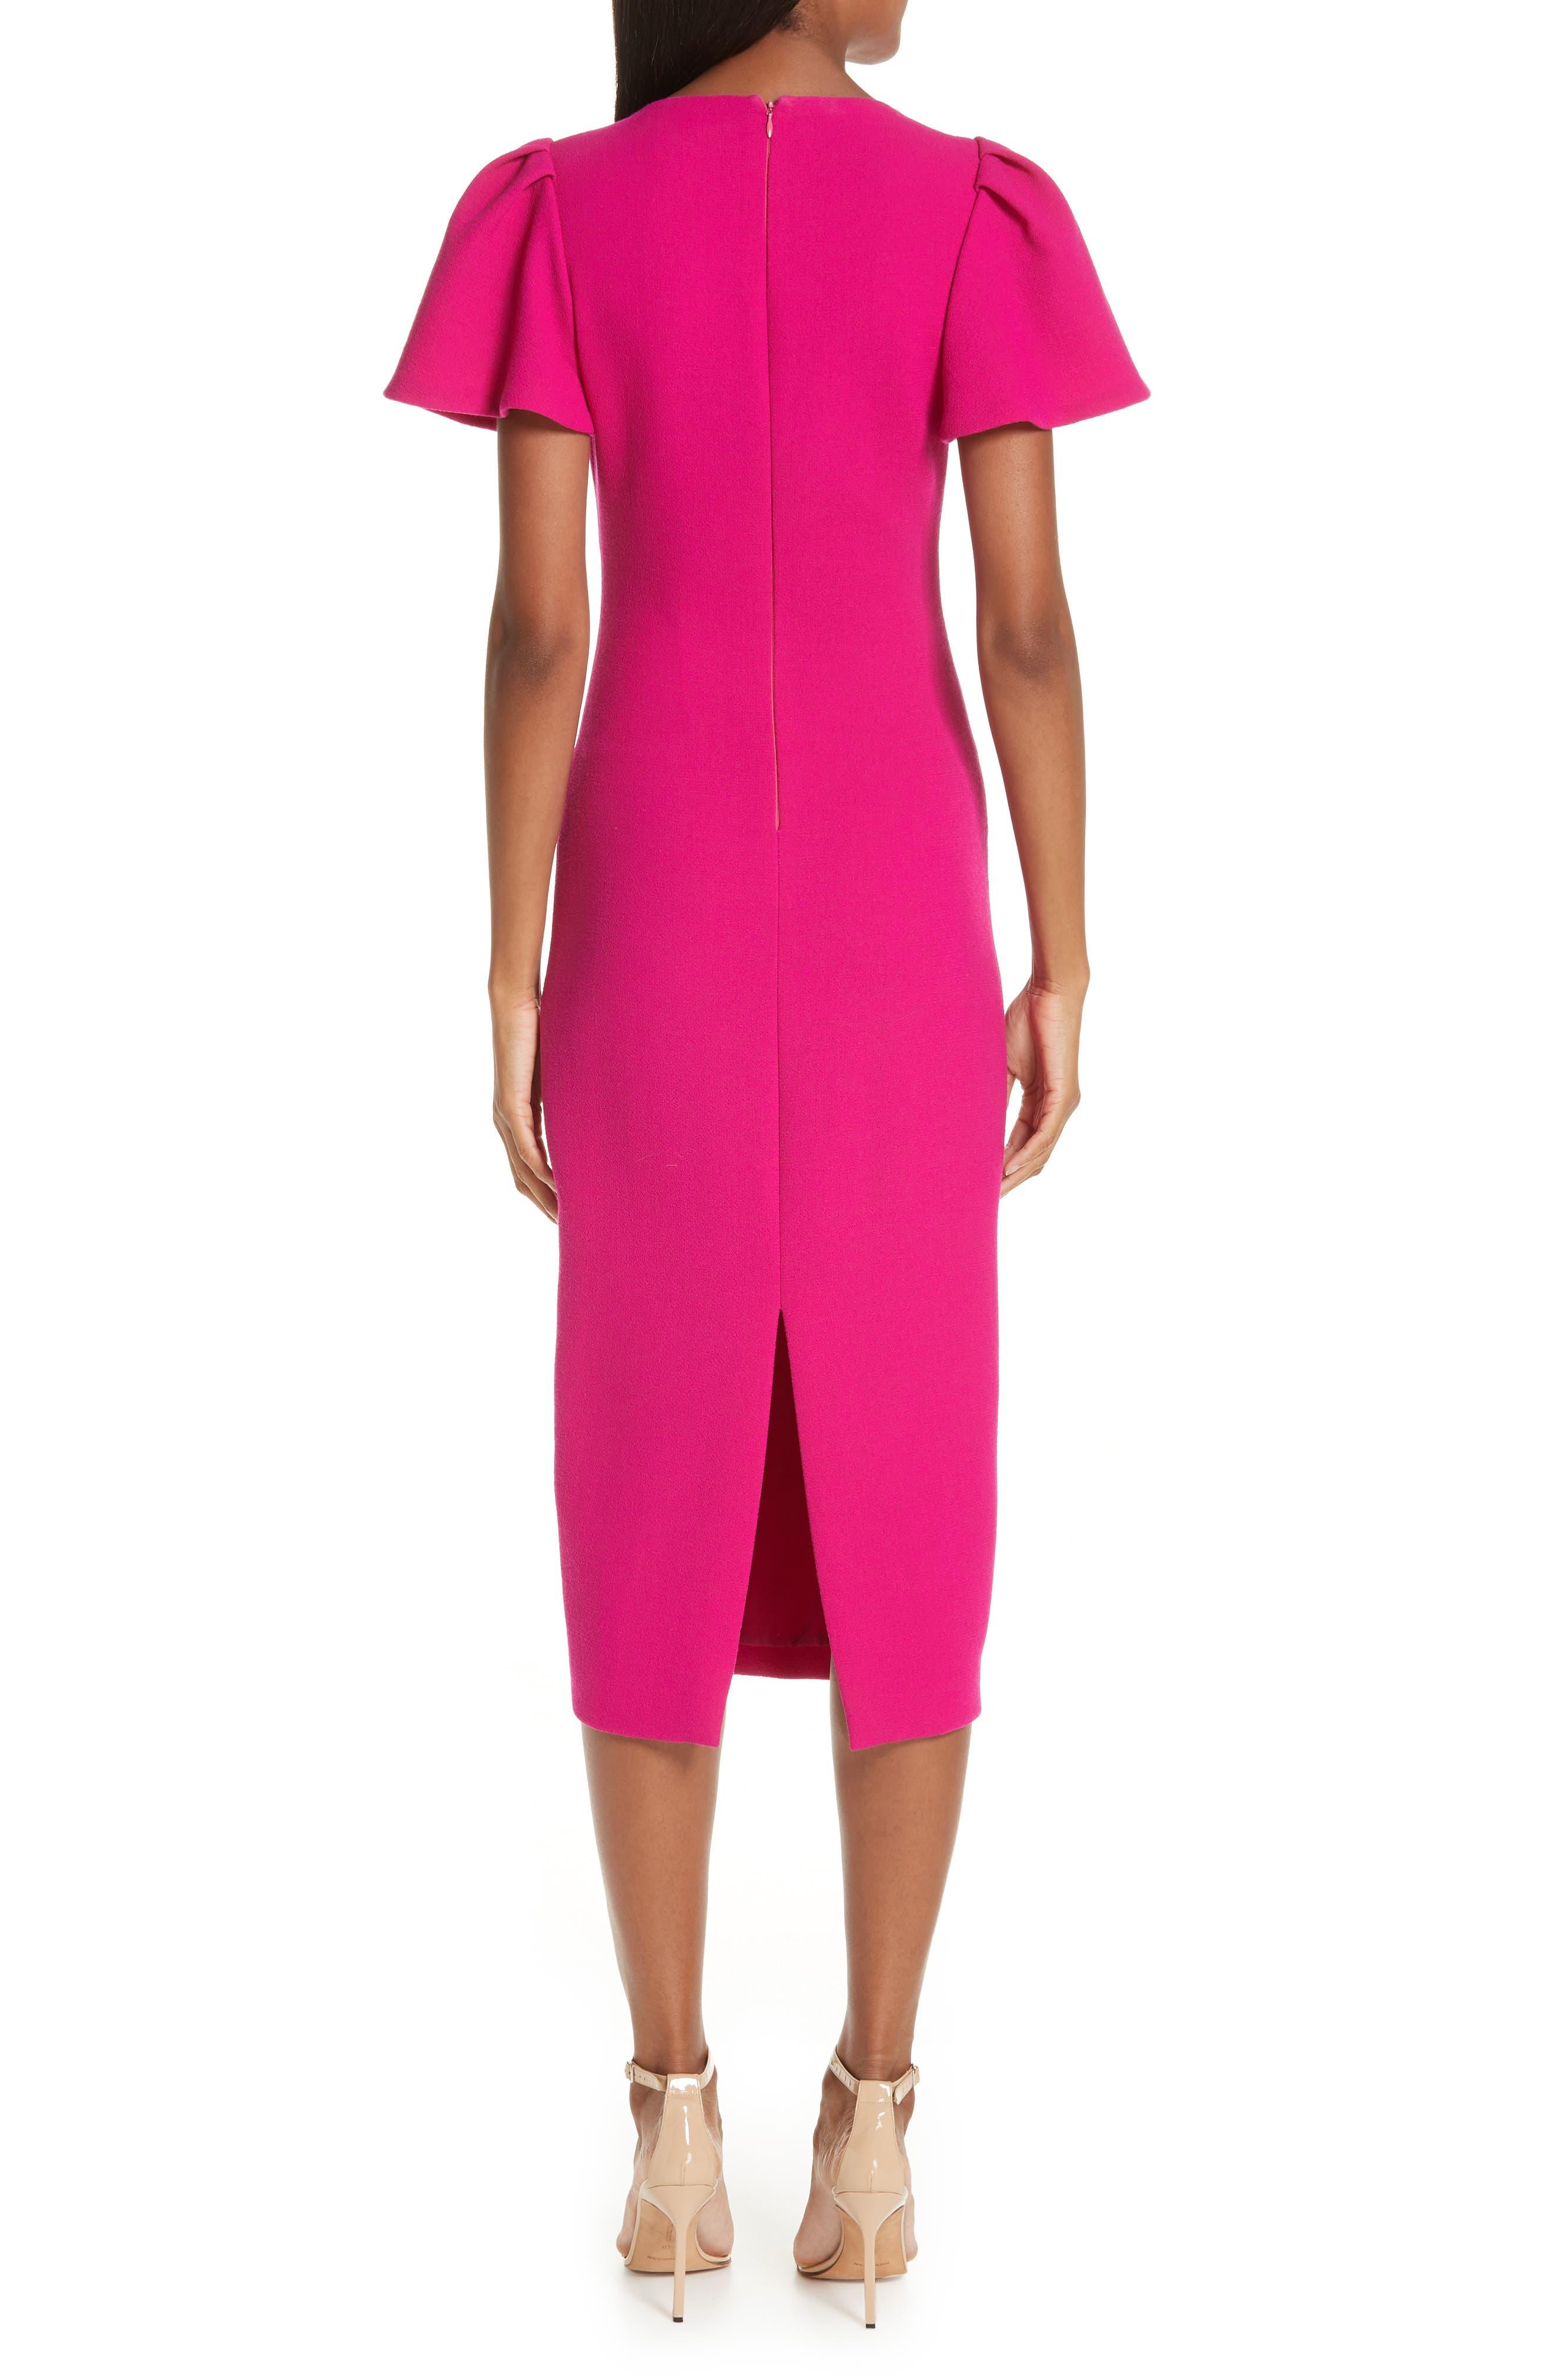 BRANDON MAXWELL, Flutter Sleeve Sheath Dress, Alternate thumbnail 2, color, MAGENTA